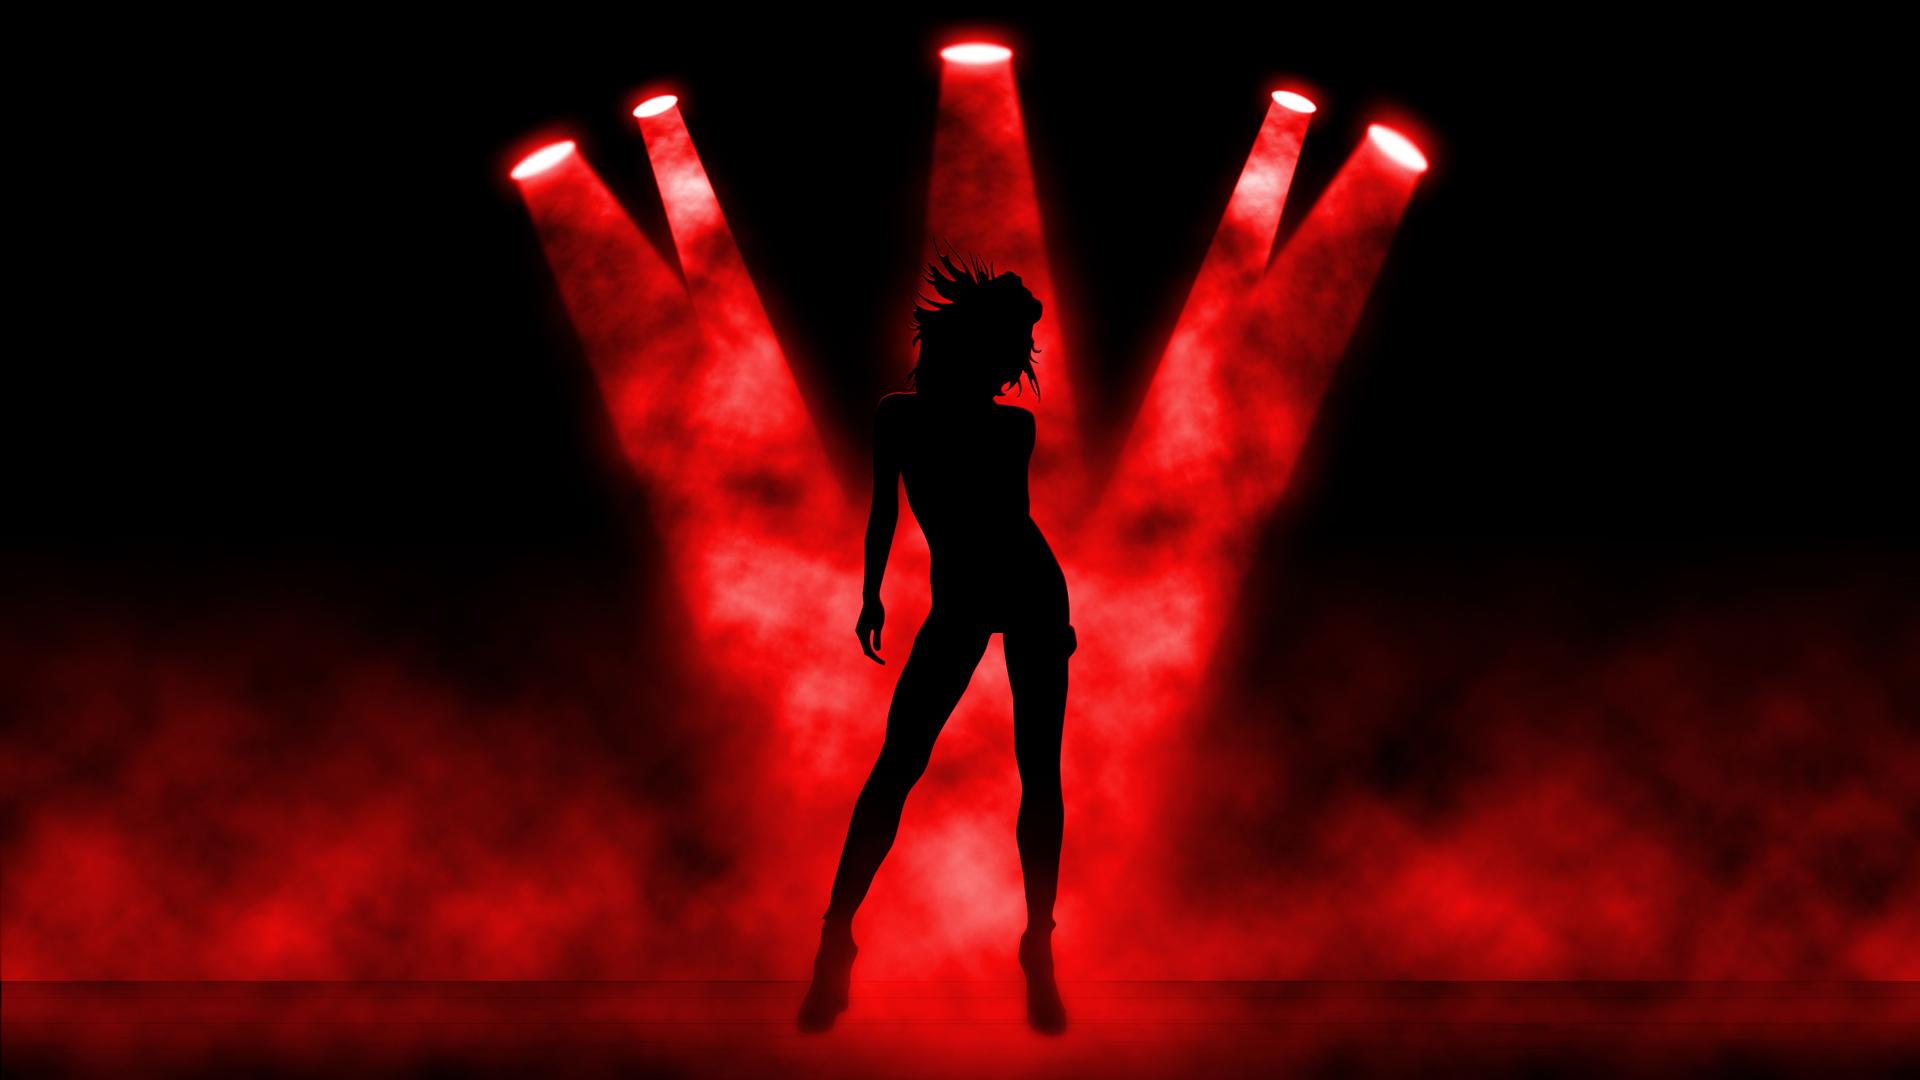 HD Dance Girl 1080p Wallpaper   Creative Graphics Wallpapers 1920x1080